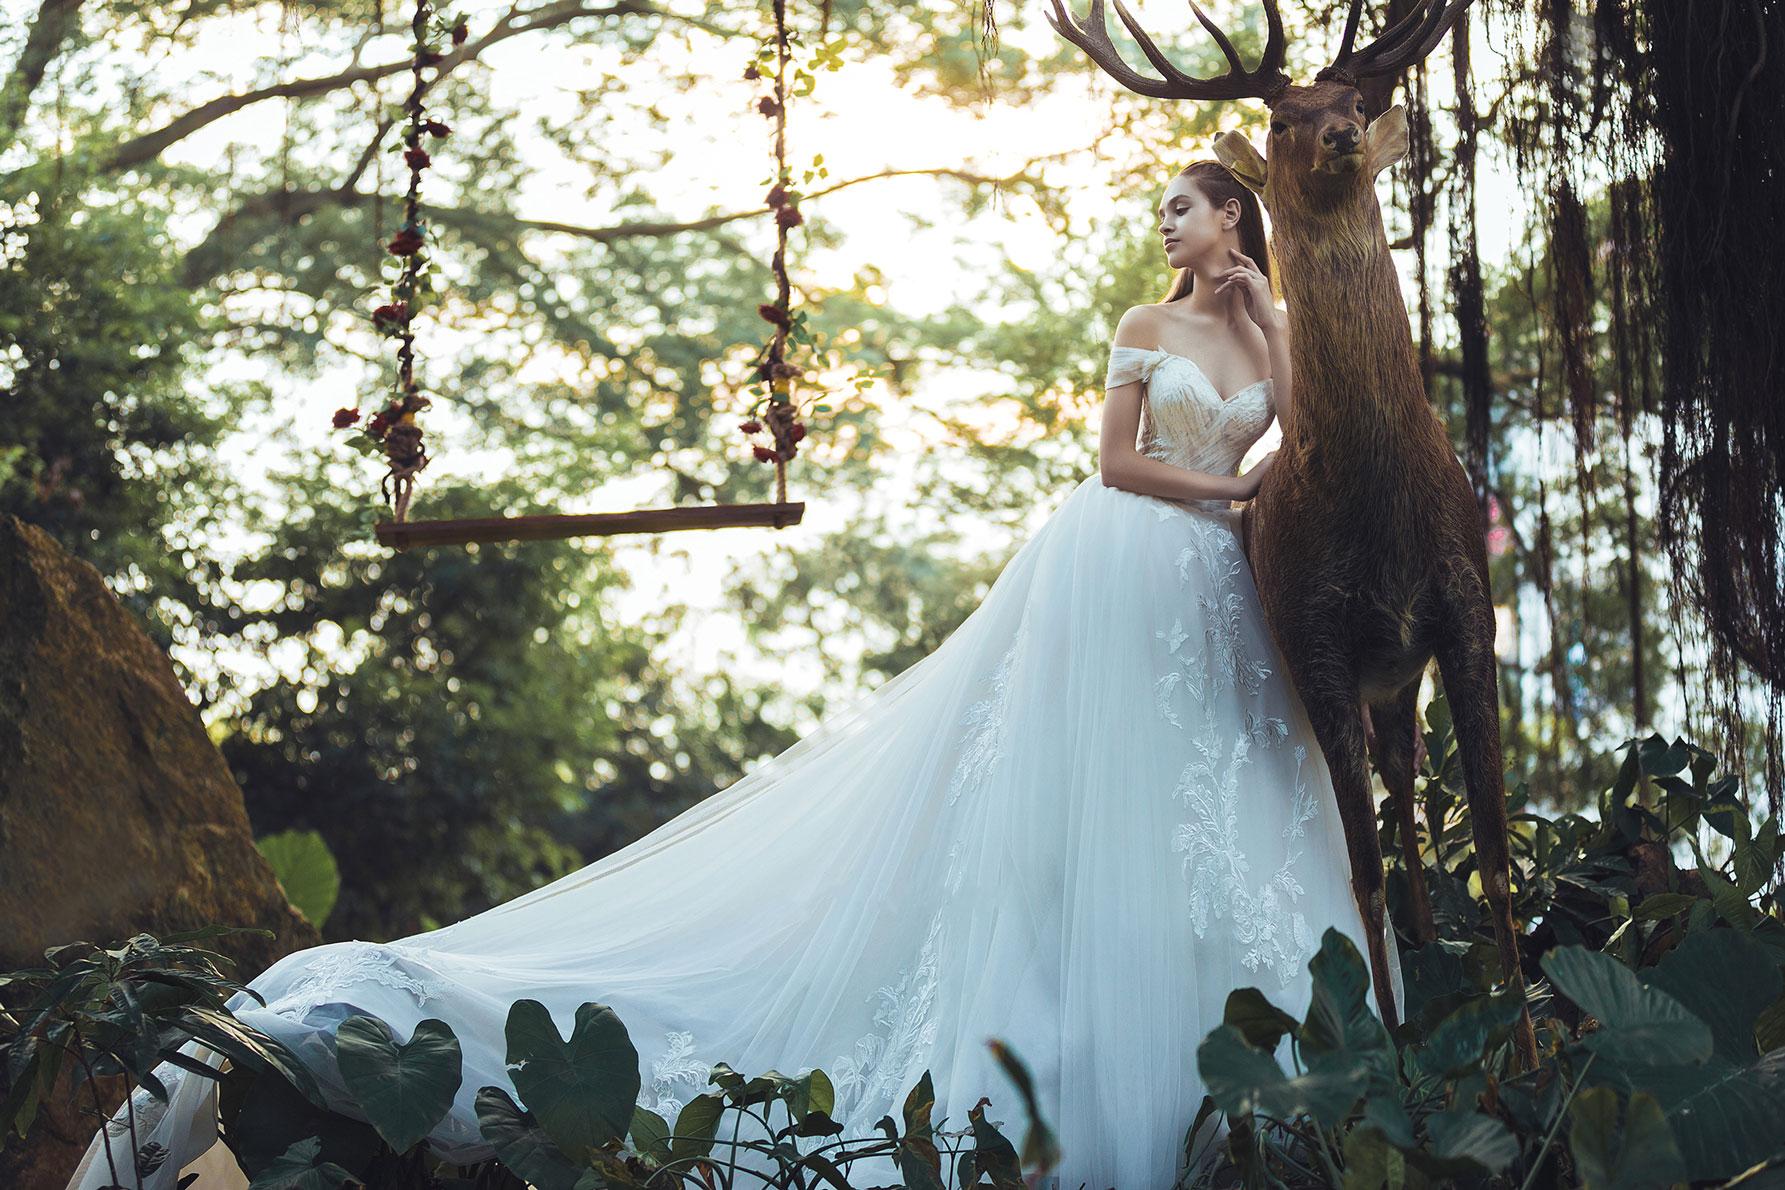 off-the-shoulder-sweetheart-a-line-wedding-dress.jpg